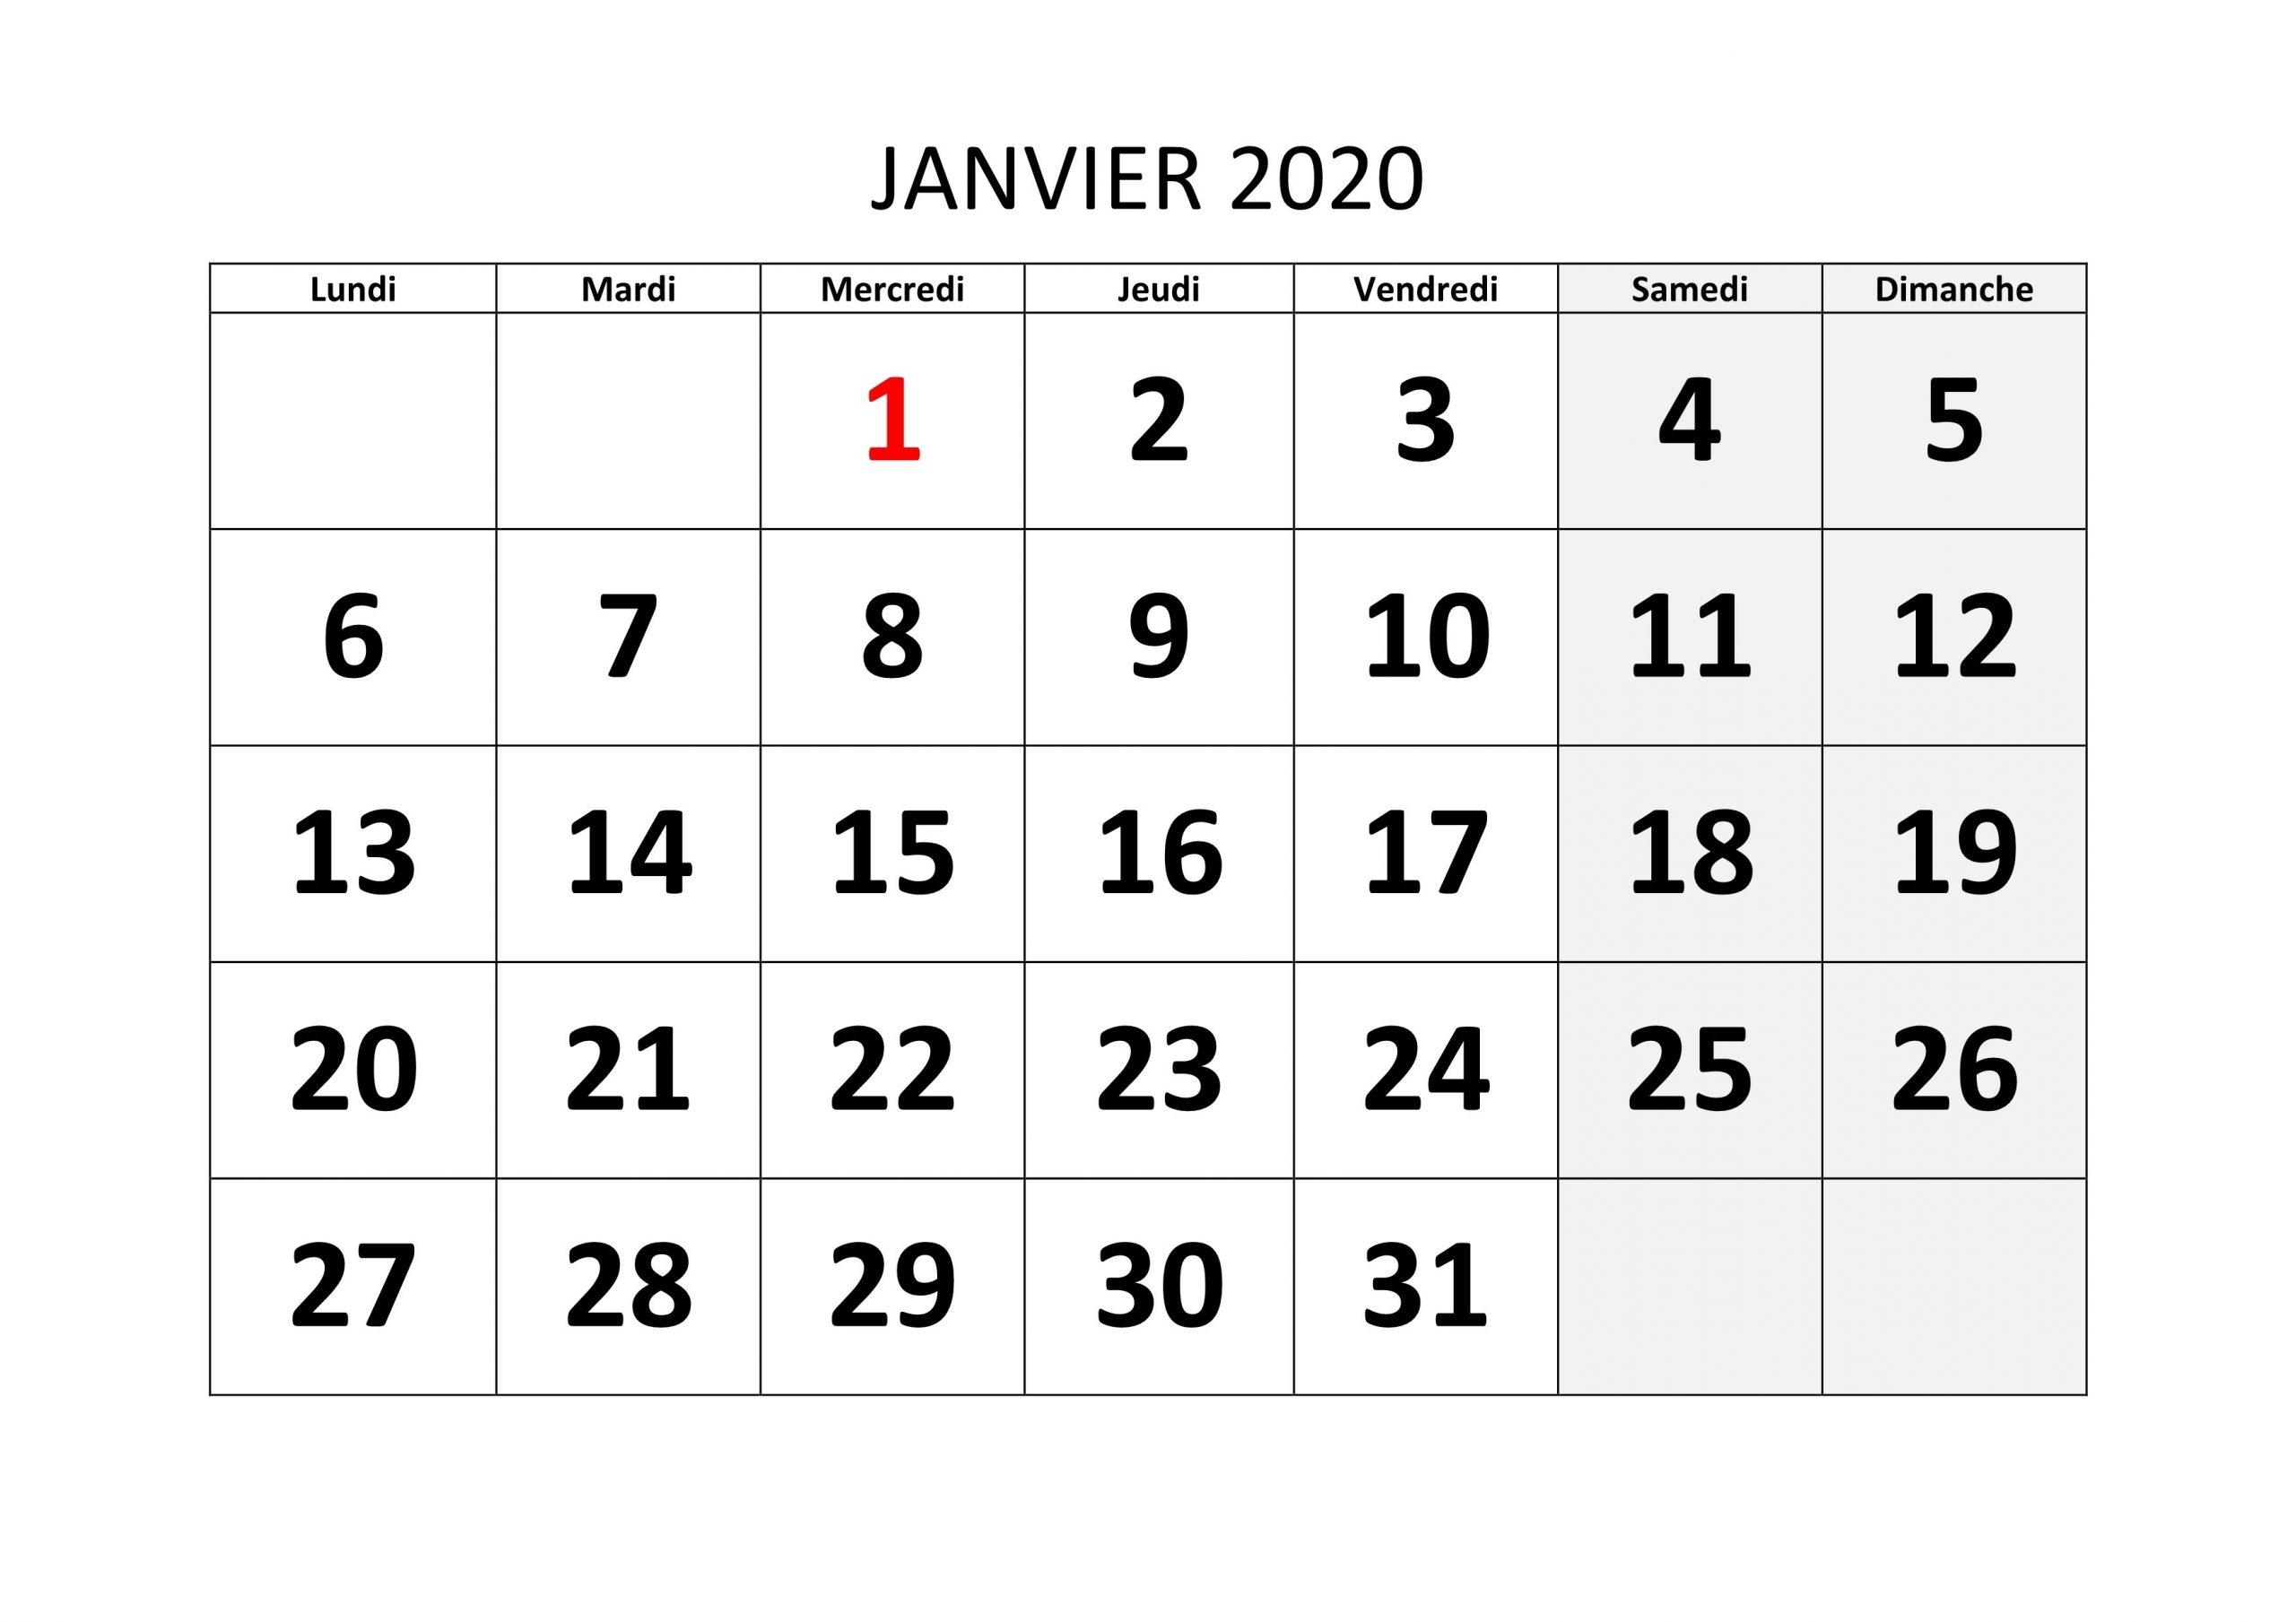 Calendrier Mensuel 2020 À Imprimer: Calendrier Mensuel Jours  Calendrier Mensuel